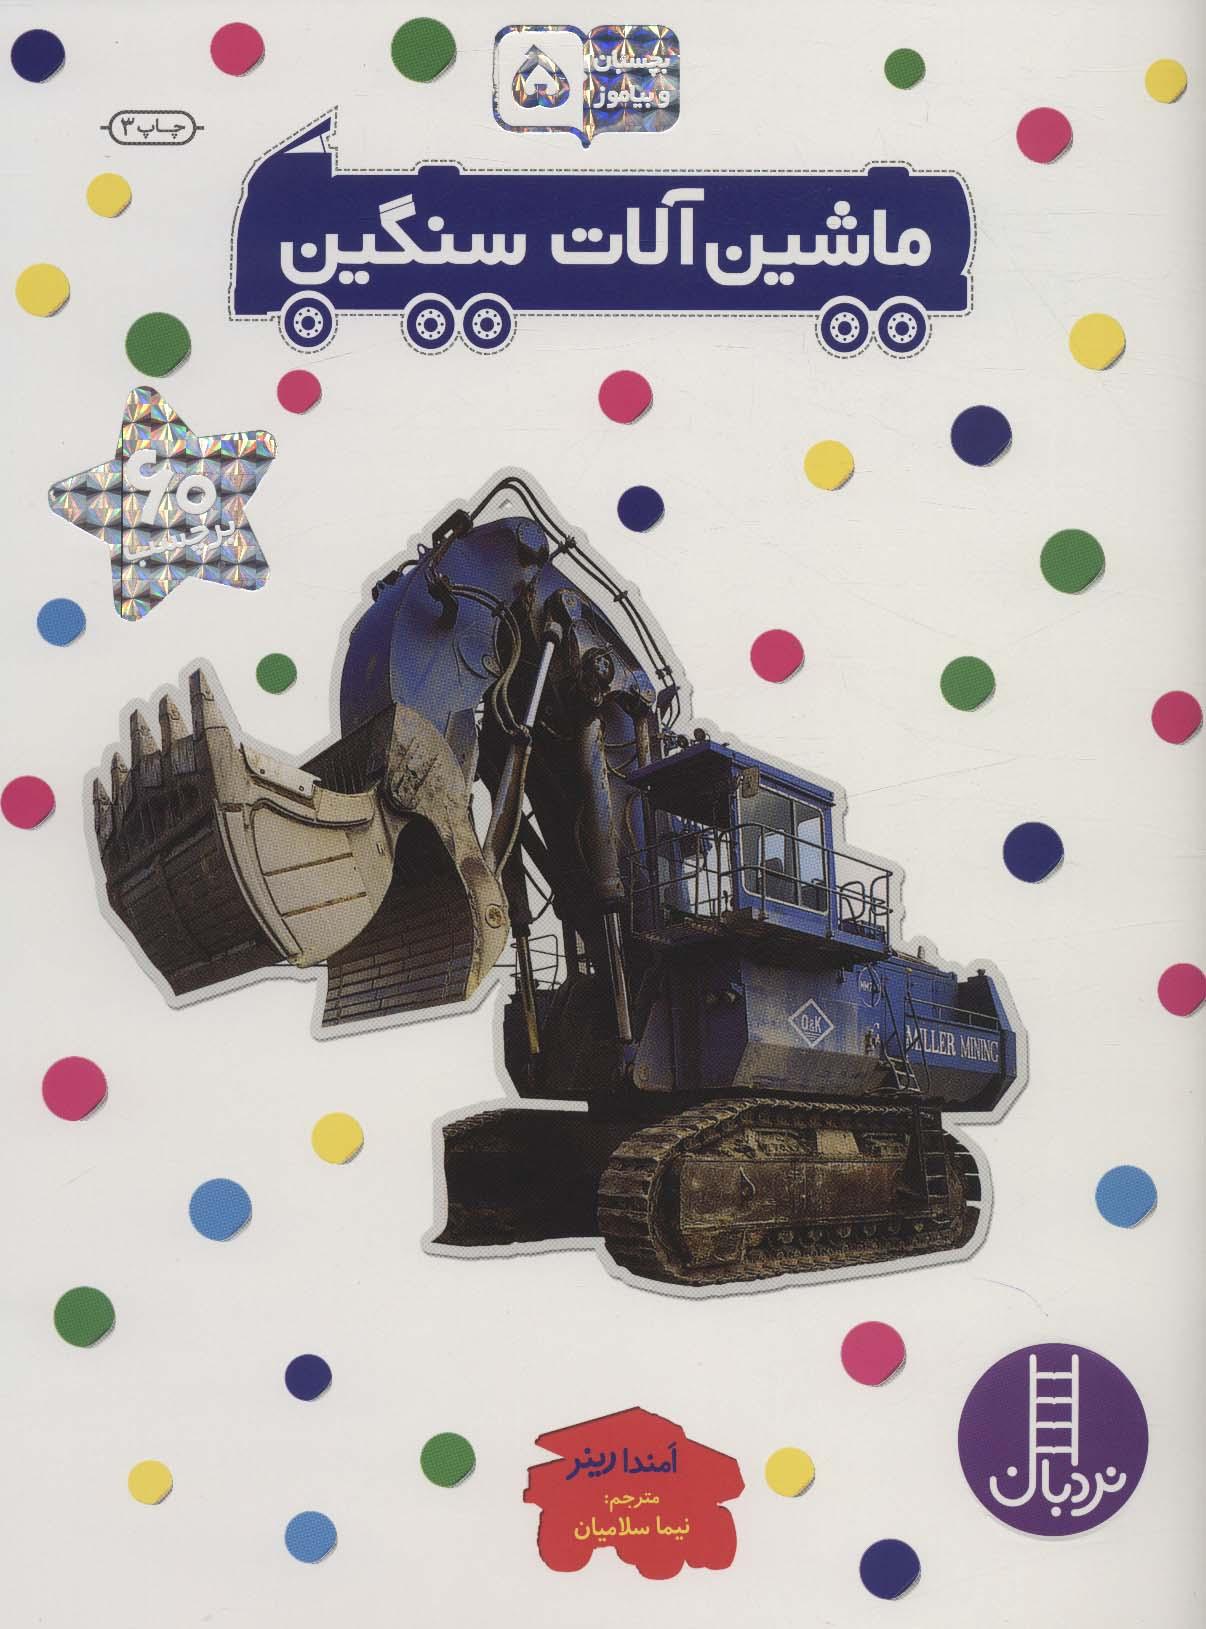 ماشین آلات سنگین (بچسبان و بیاموز 5)